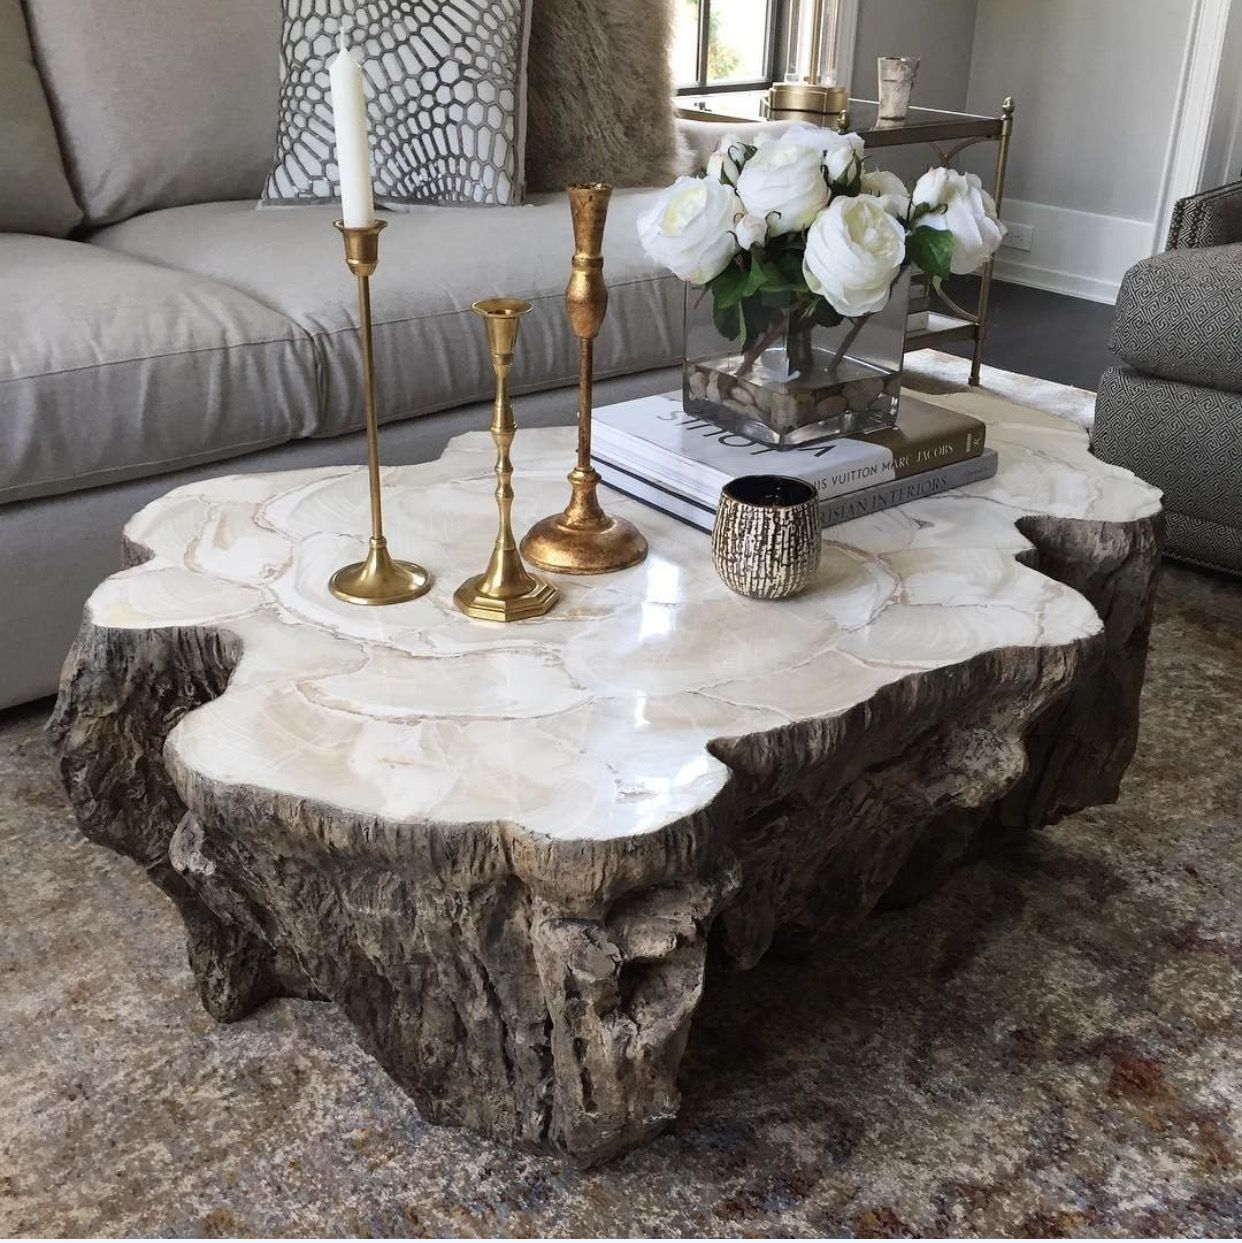 Petrified Wood Coffee Table 4 500 Coffee Table Coffee Table Wood Modern African Decor [ 1243 x 1242 Pixel ]